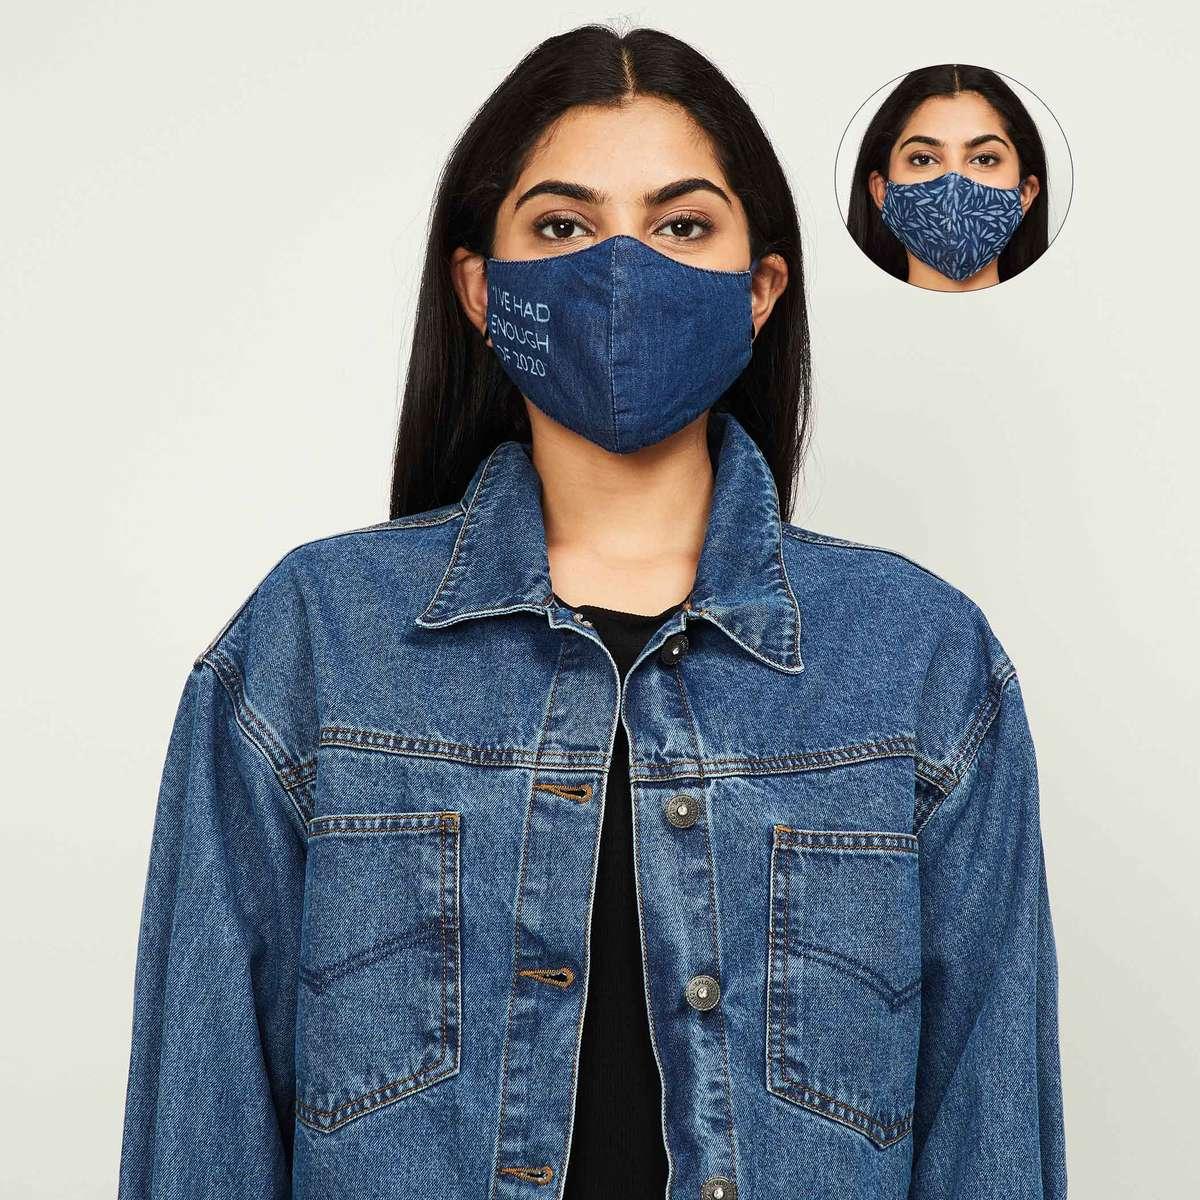 5.GINGER Women Printed Denim Face Mask - Pack of 2